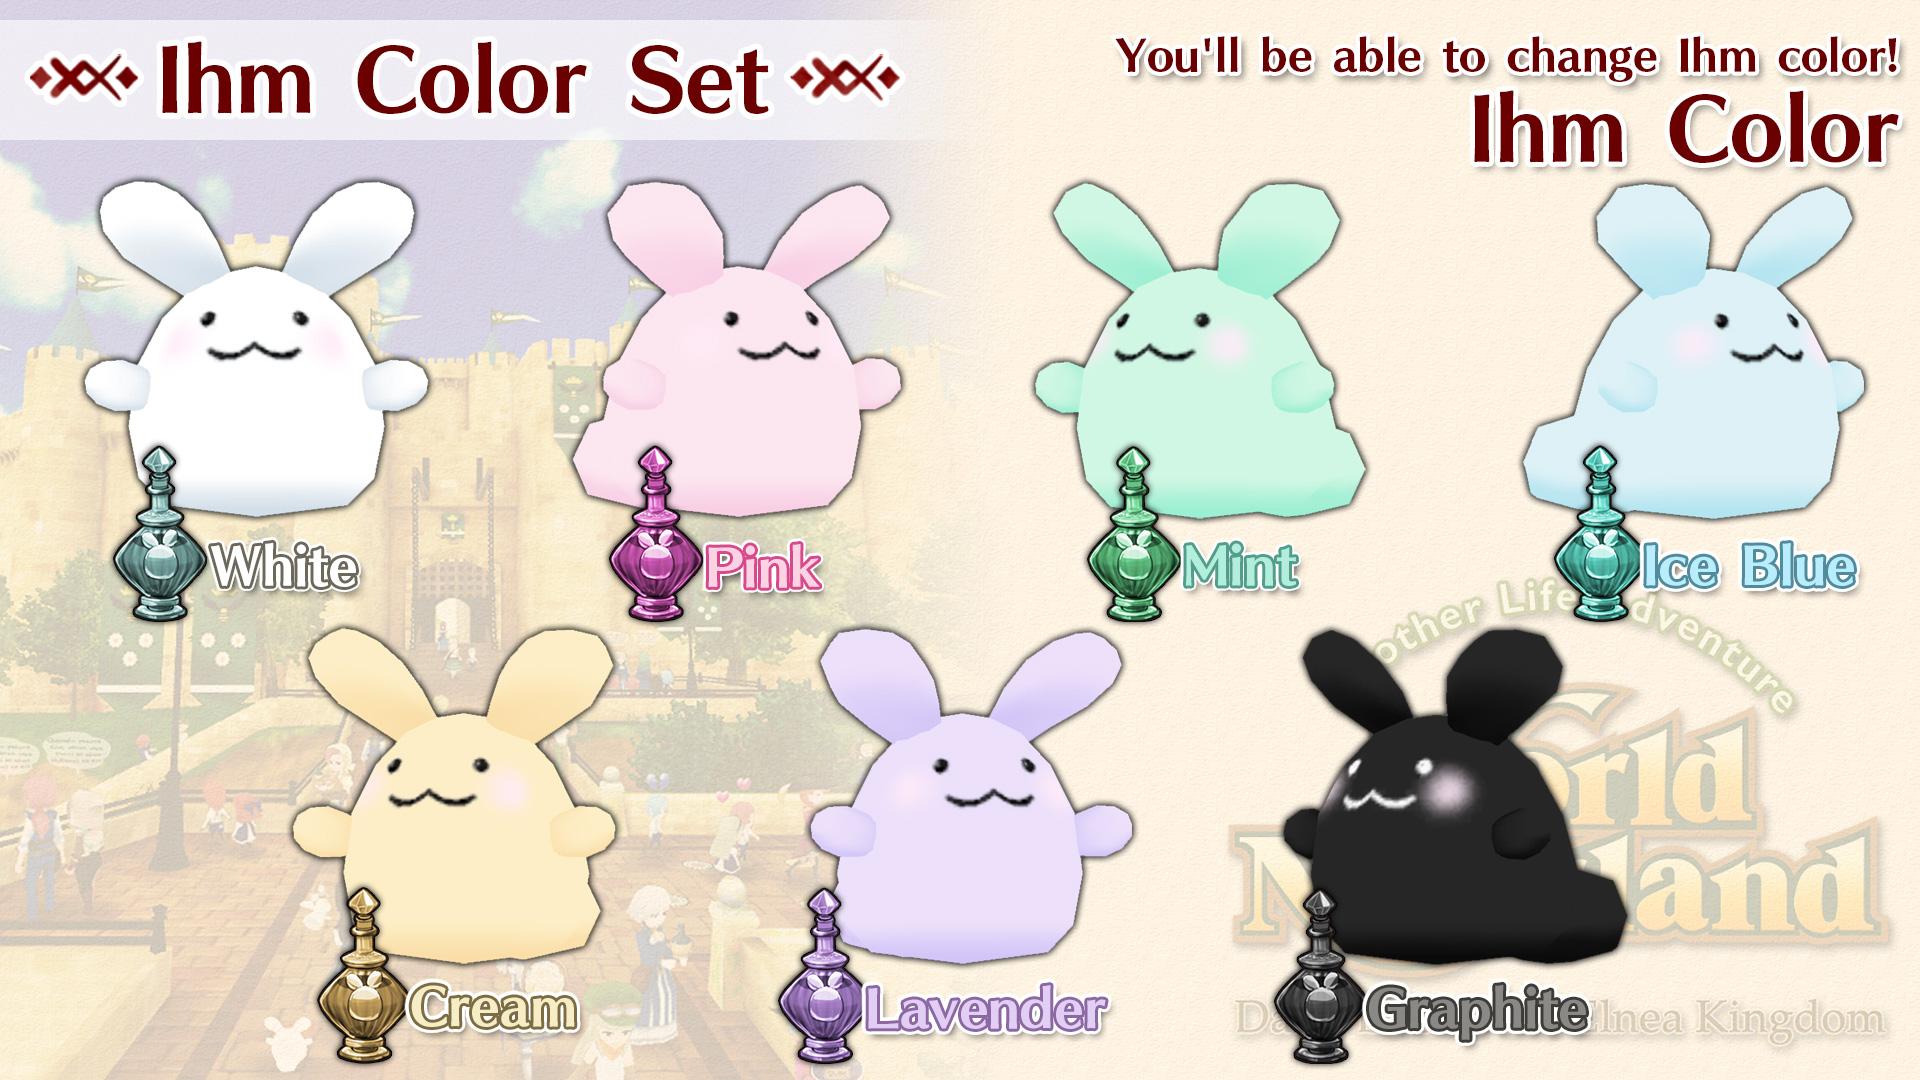 Ihm Color Set (White, Pink, Mint, Ice Blue, Cream, Lavender, Graphite)